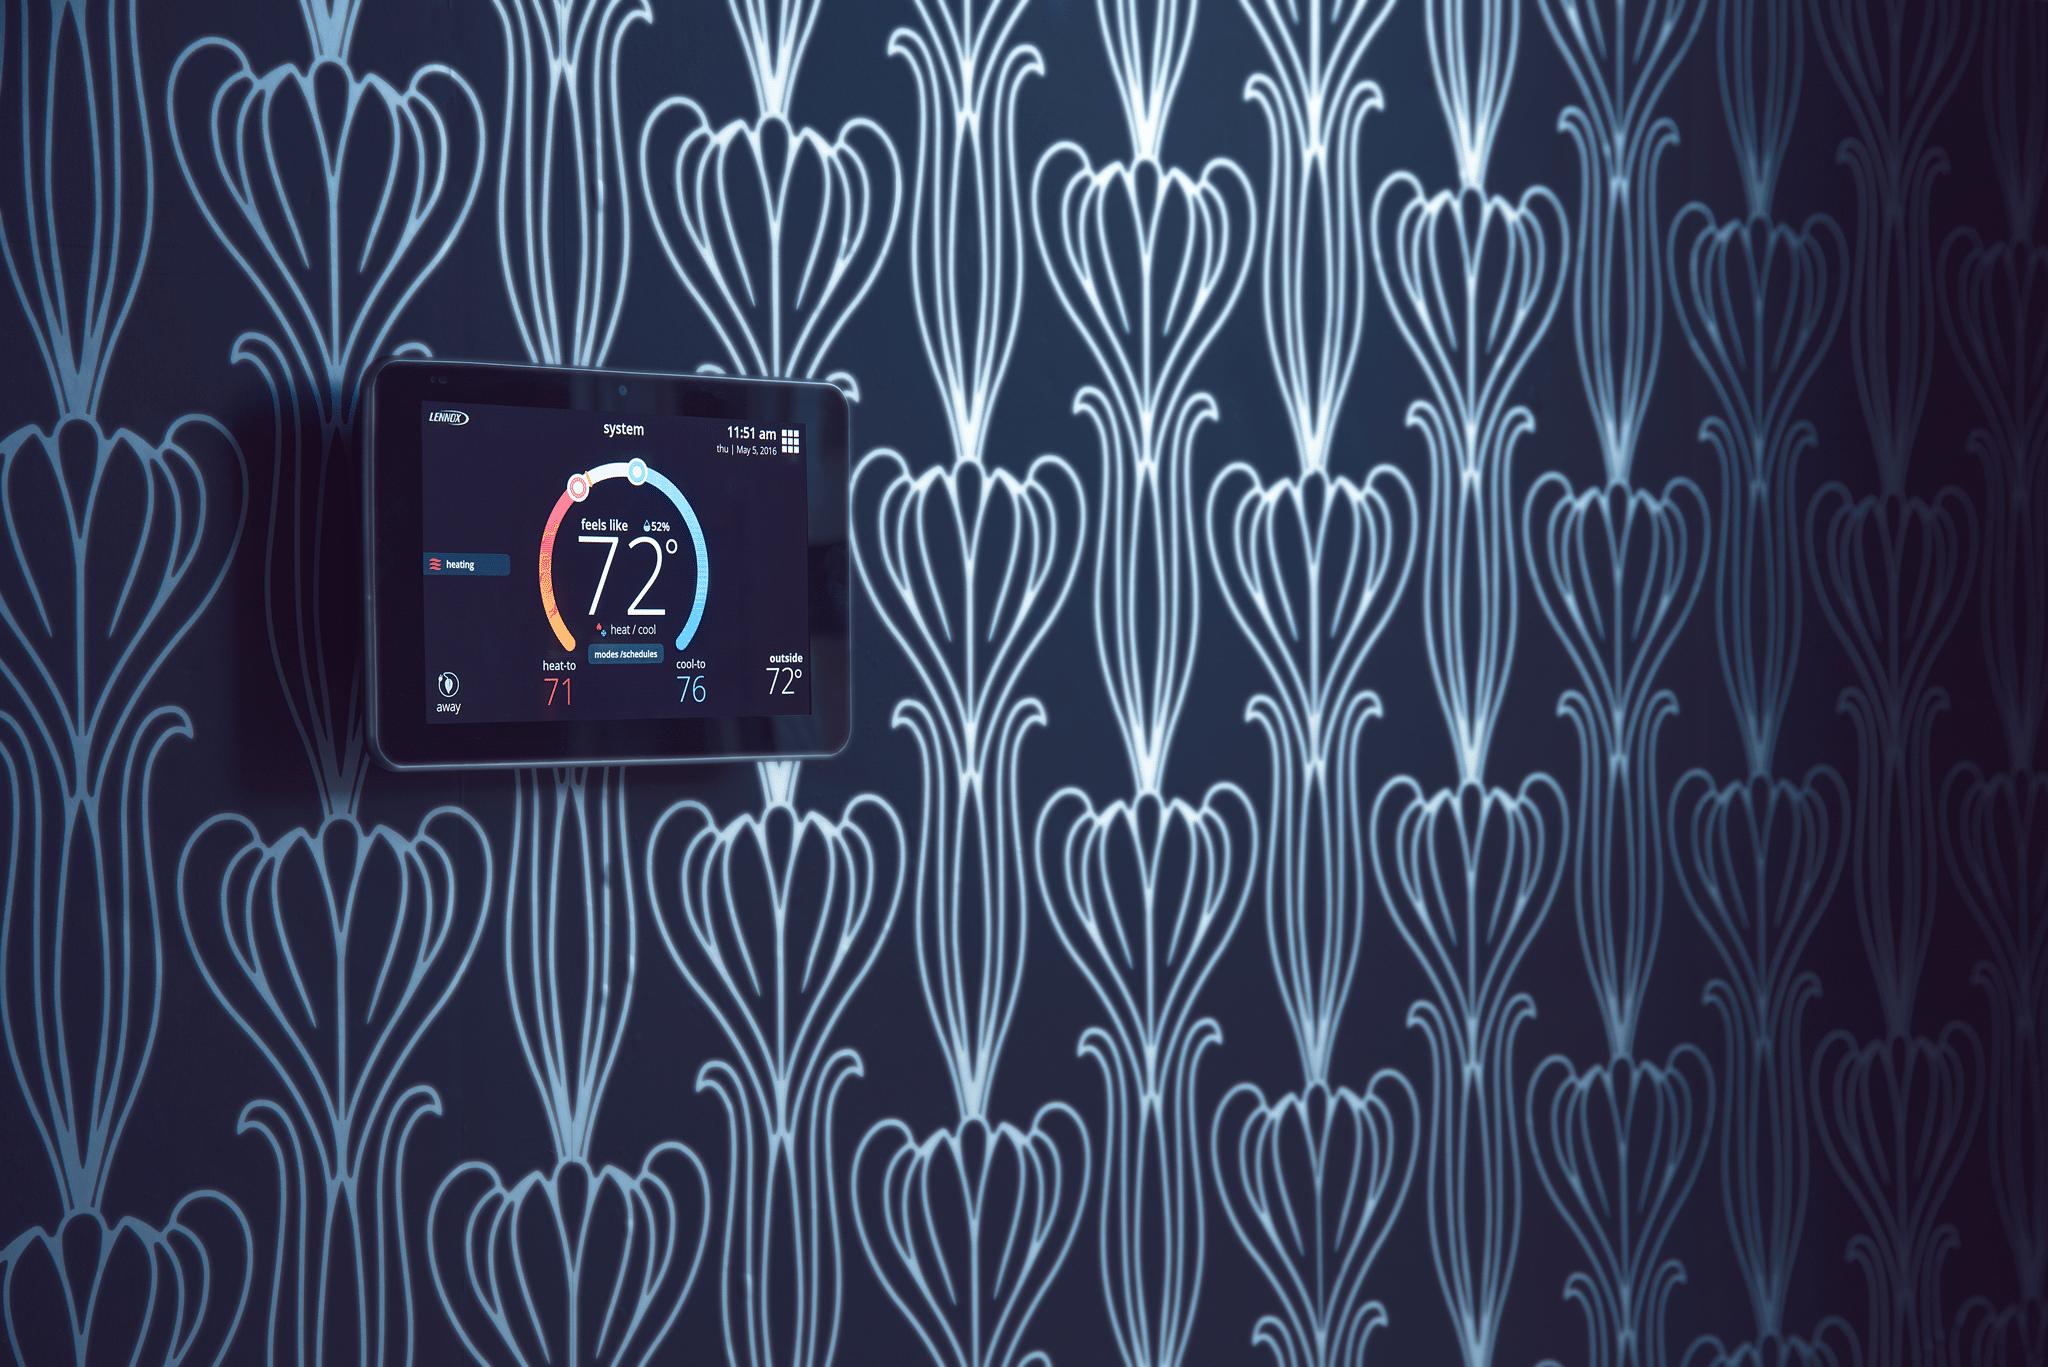 Lennox iComfort S30 Thermostat